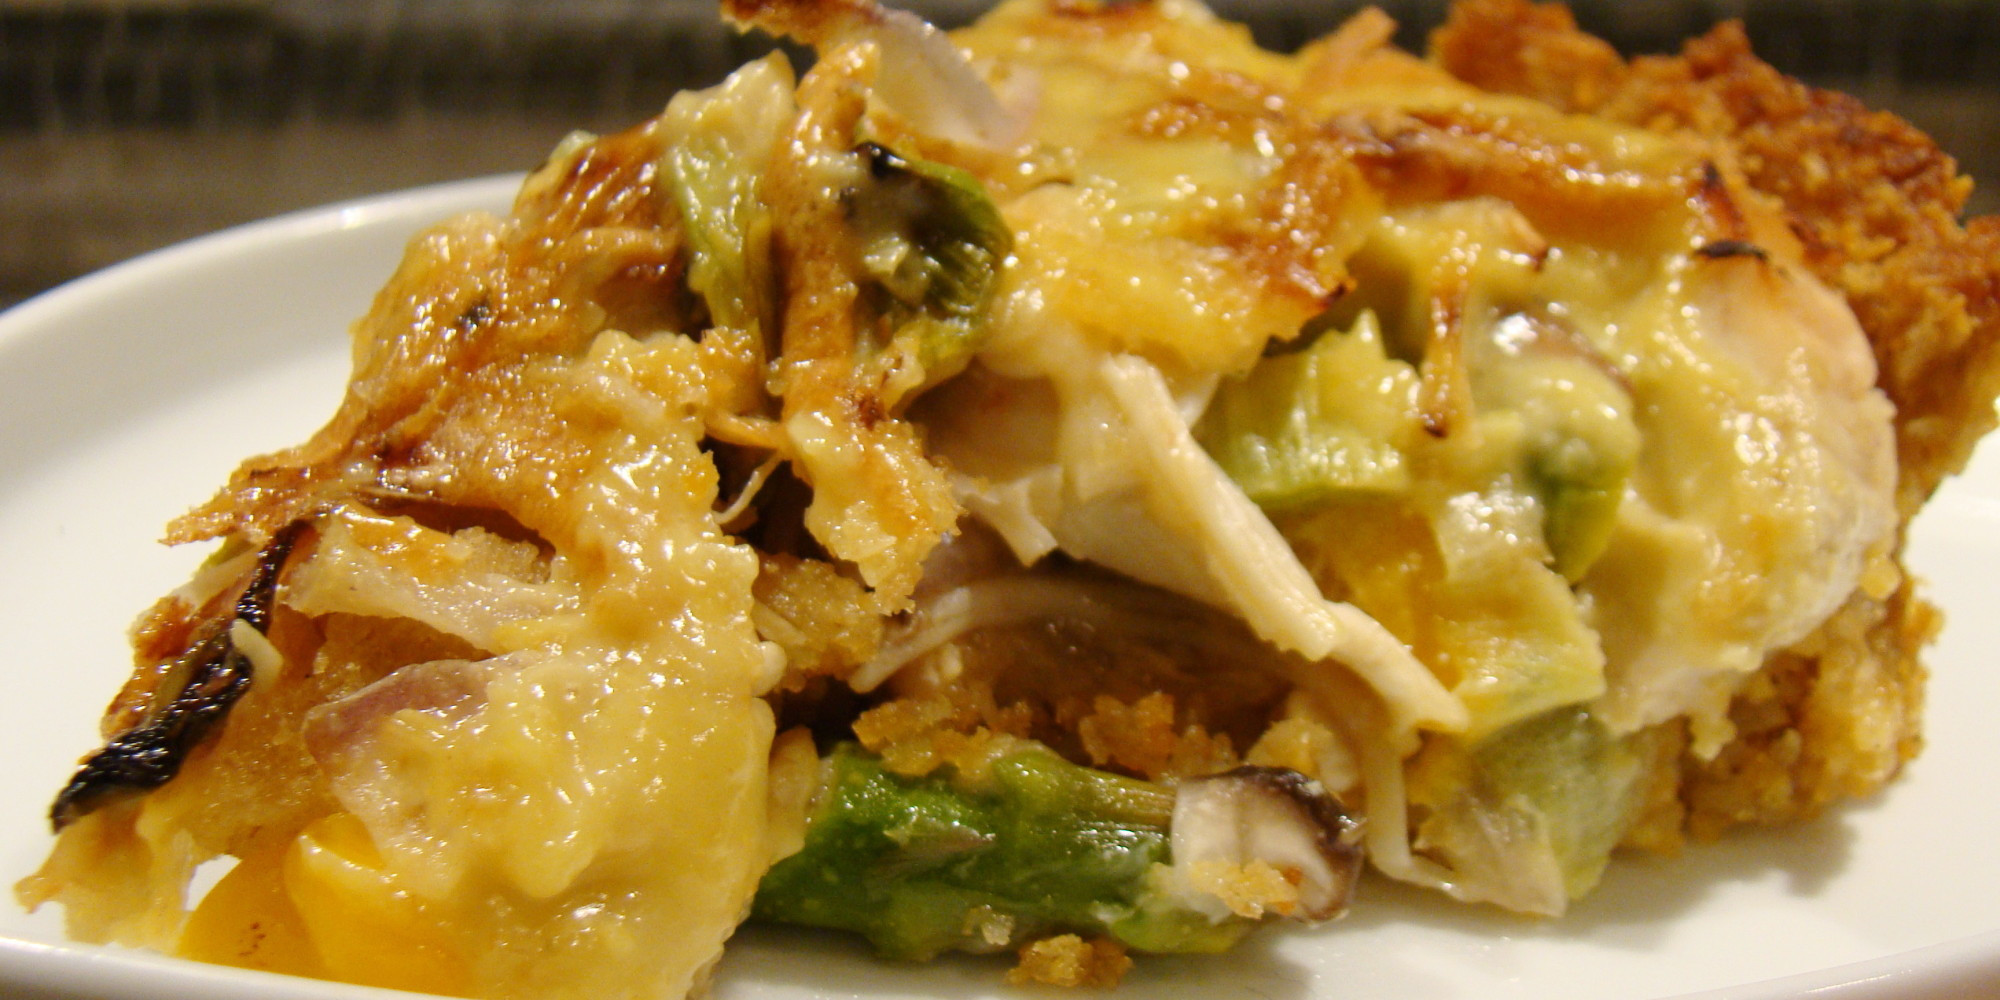 Vegetarian Thanksgiving Main Dishes  33 Ve arian Thanksgiving Main Dishes Made With Real Food